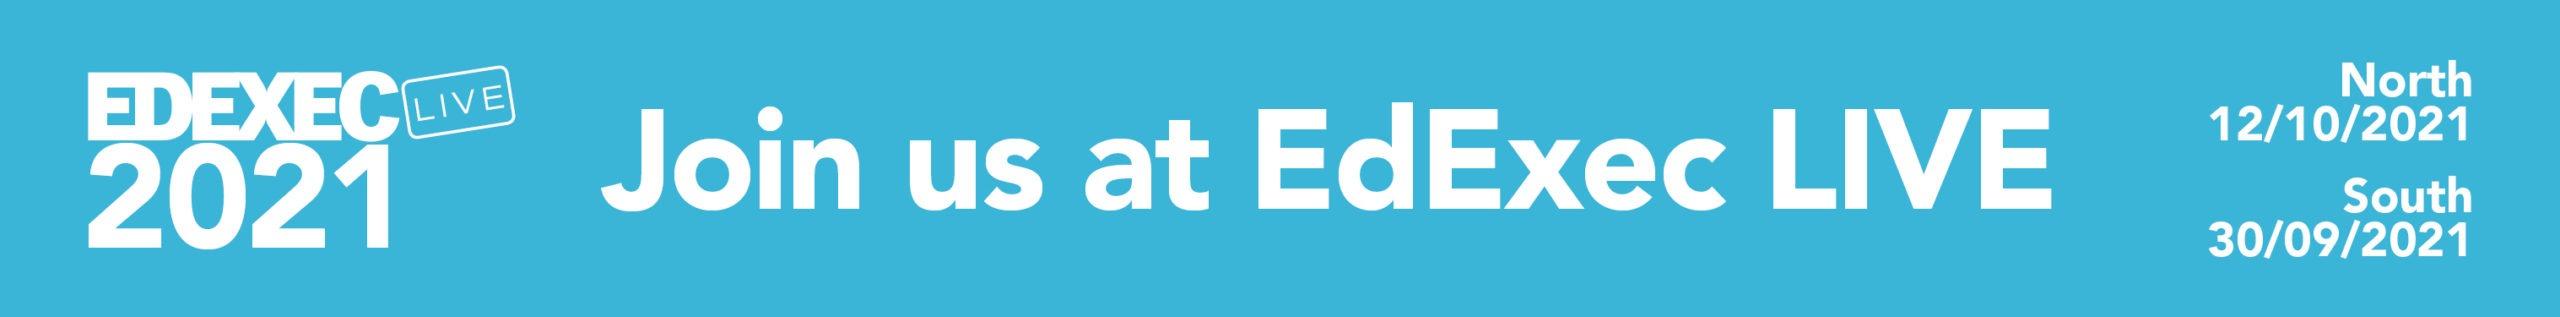 EEL2021_Leaderboard7